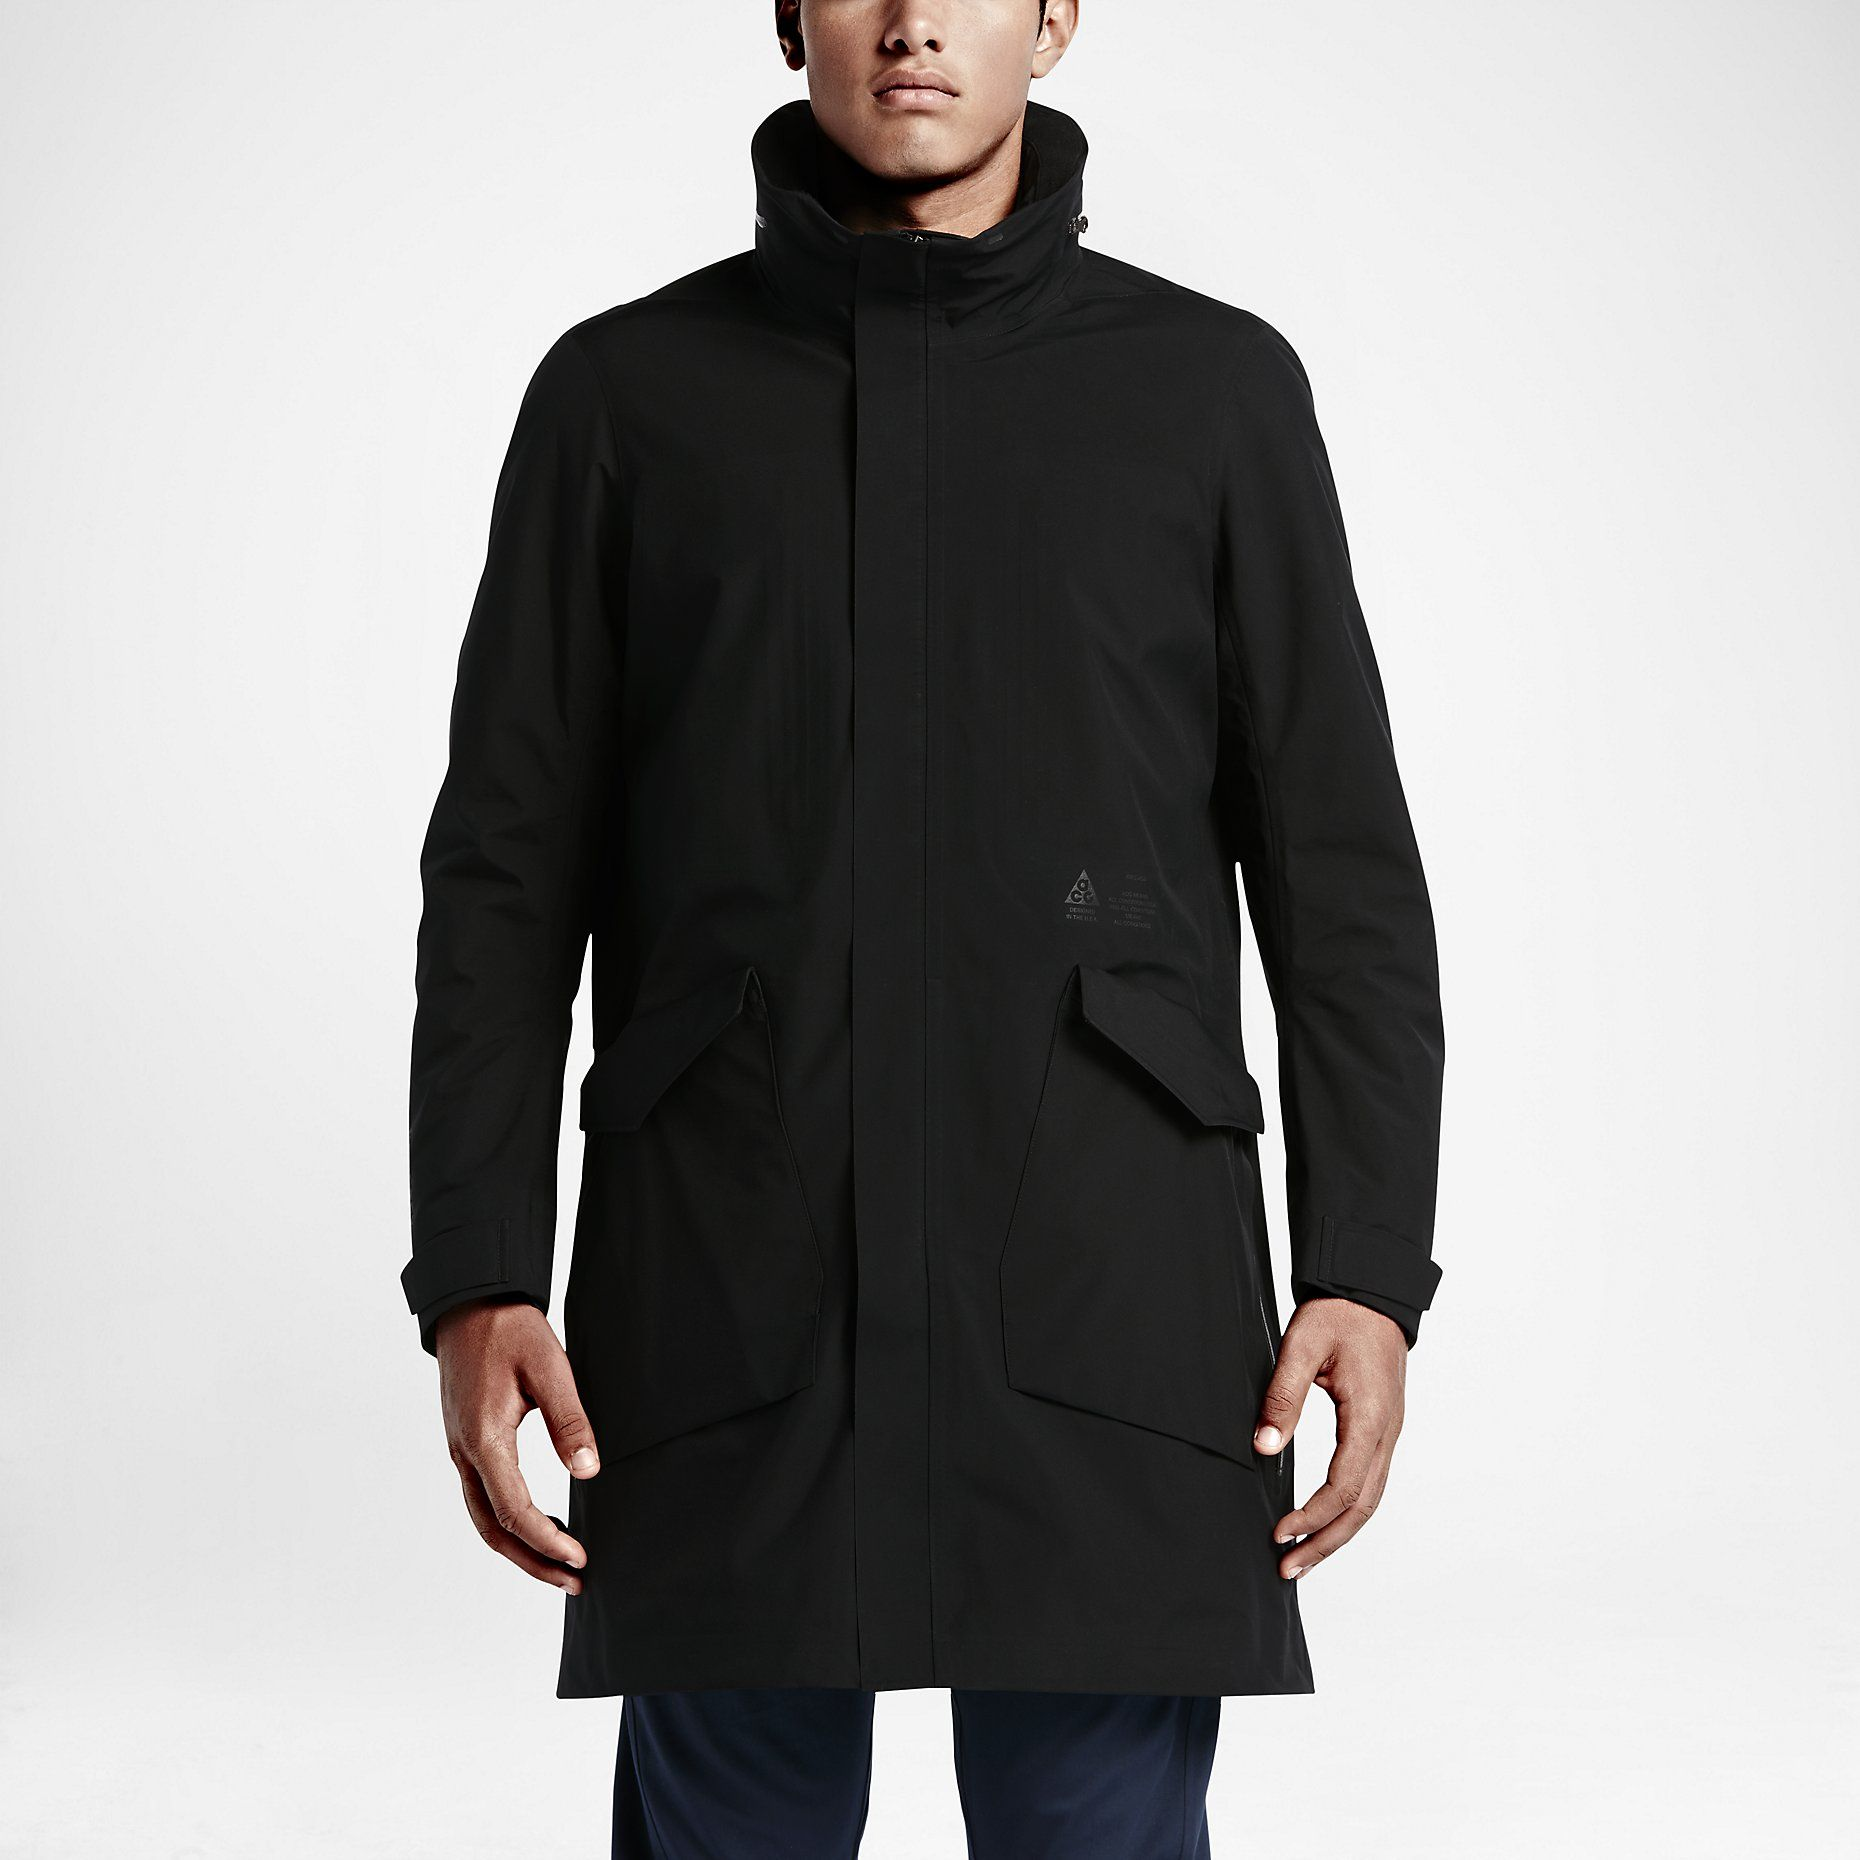 729cf11fb NikeLab ACG System Men's Long Bomber Jacket. Nike.com | favorite ...